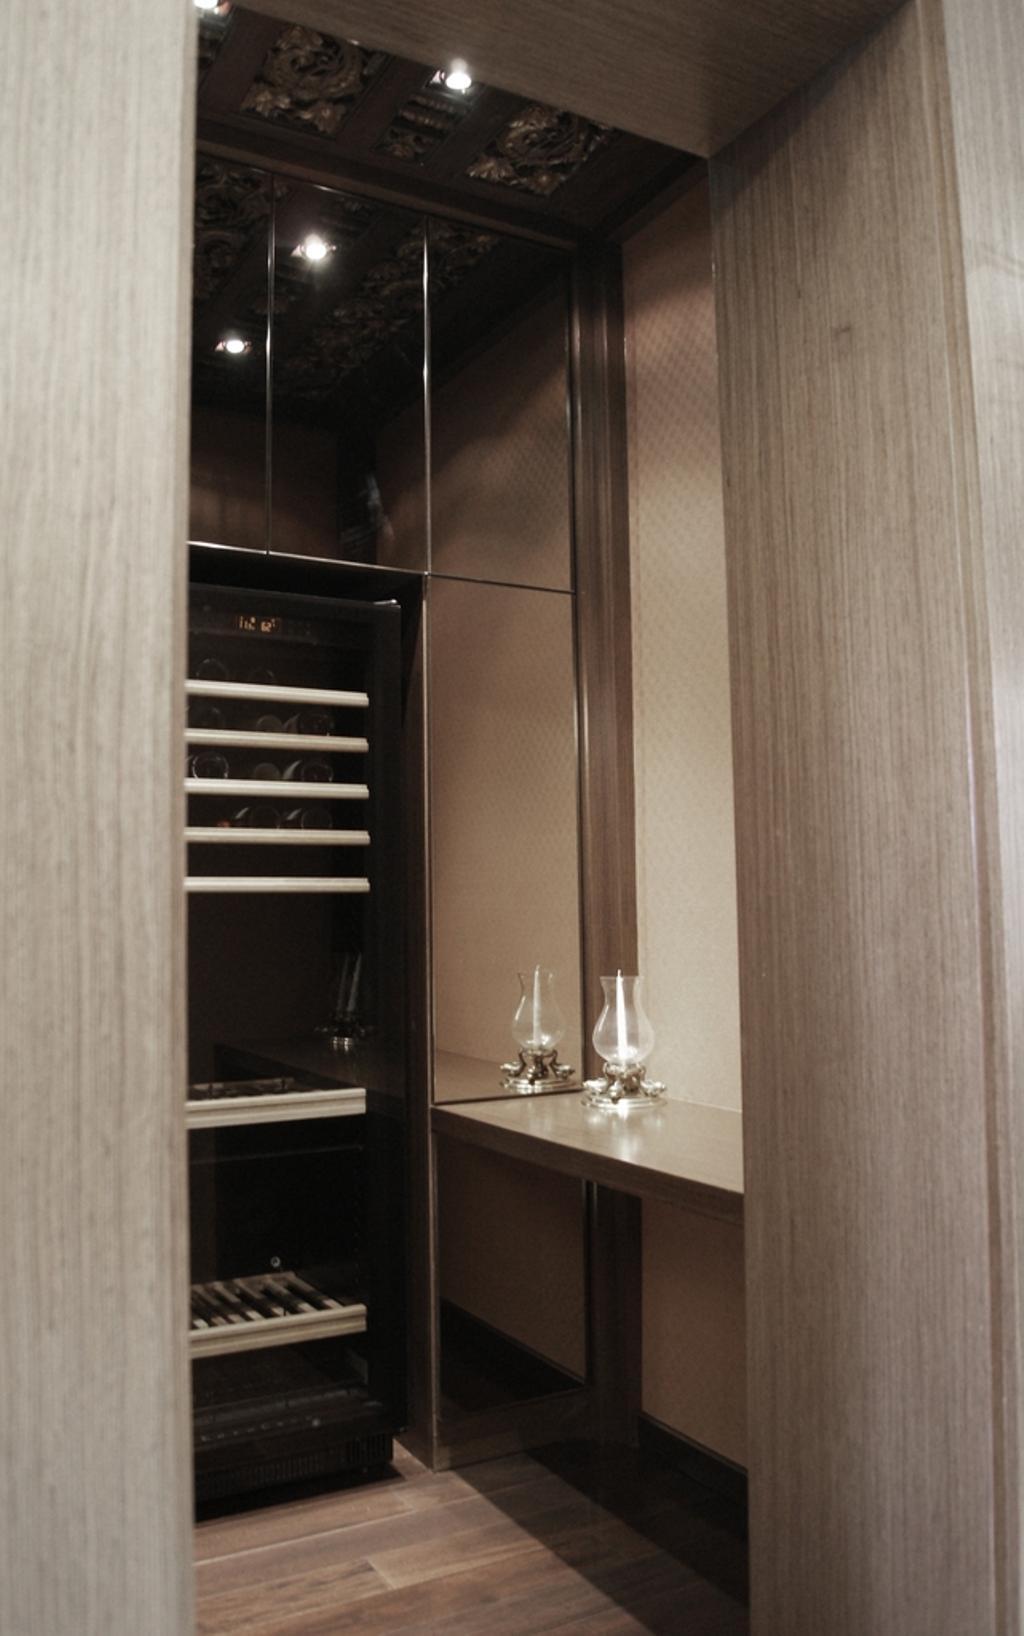 Transitional, Condo, Kitchen, The Levelz, Interior Designer, Metamorph Design, Wood Laminate, Laminate, Appliance, Electrical Device, Oven